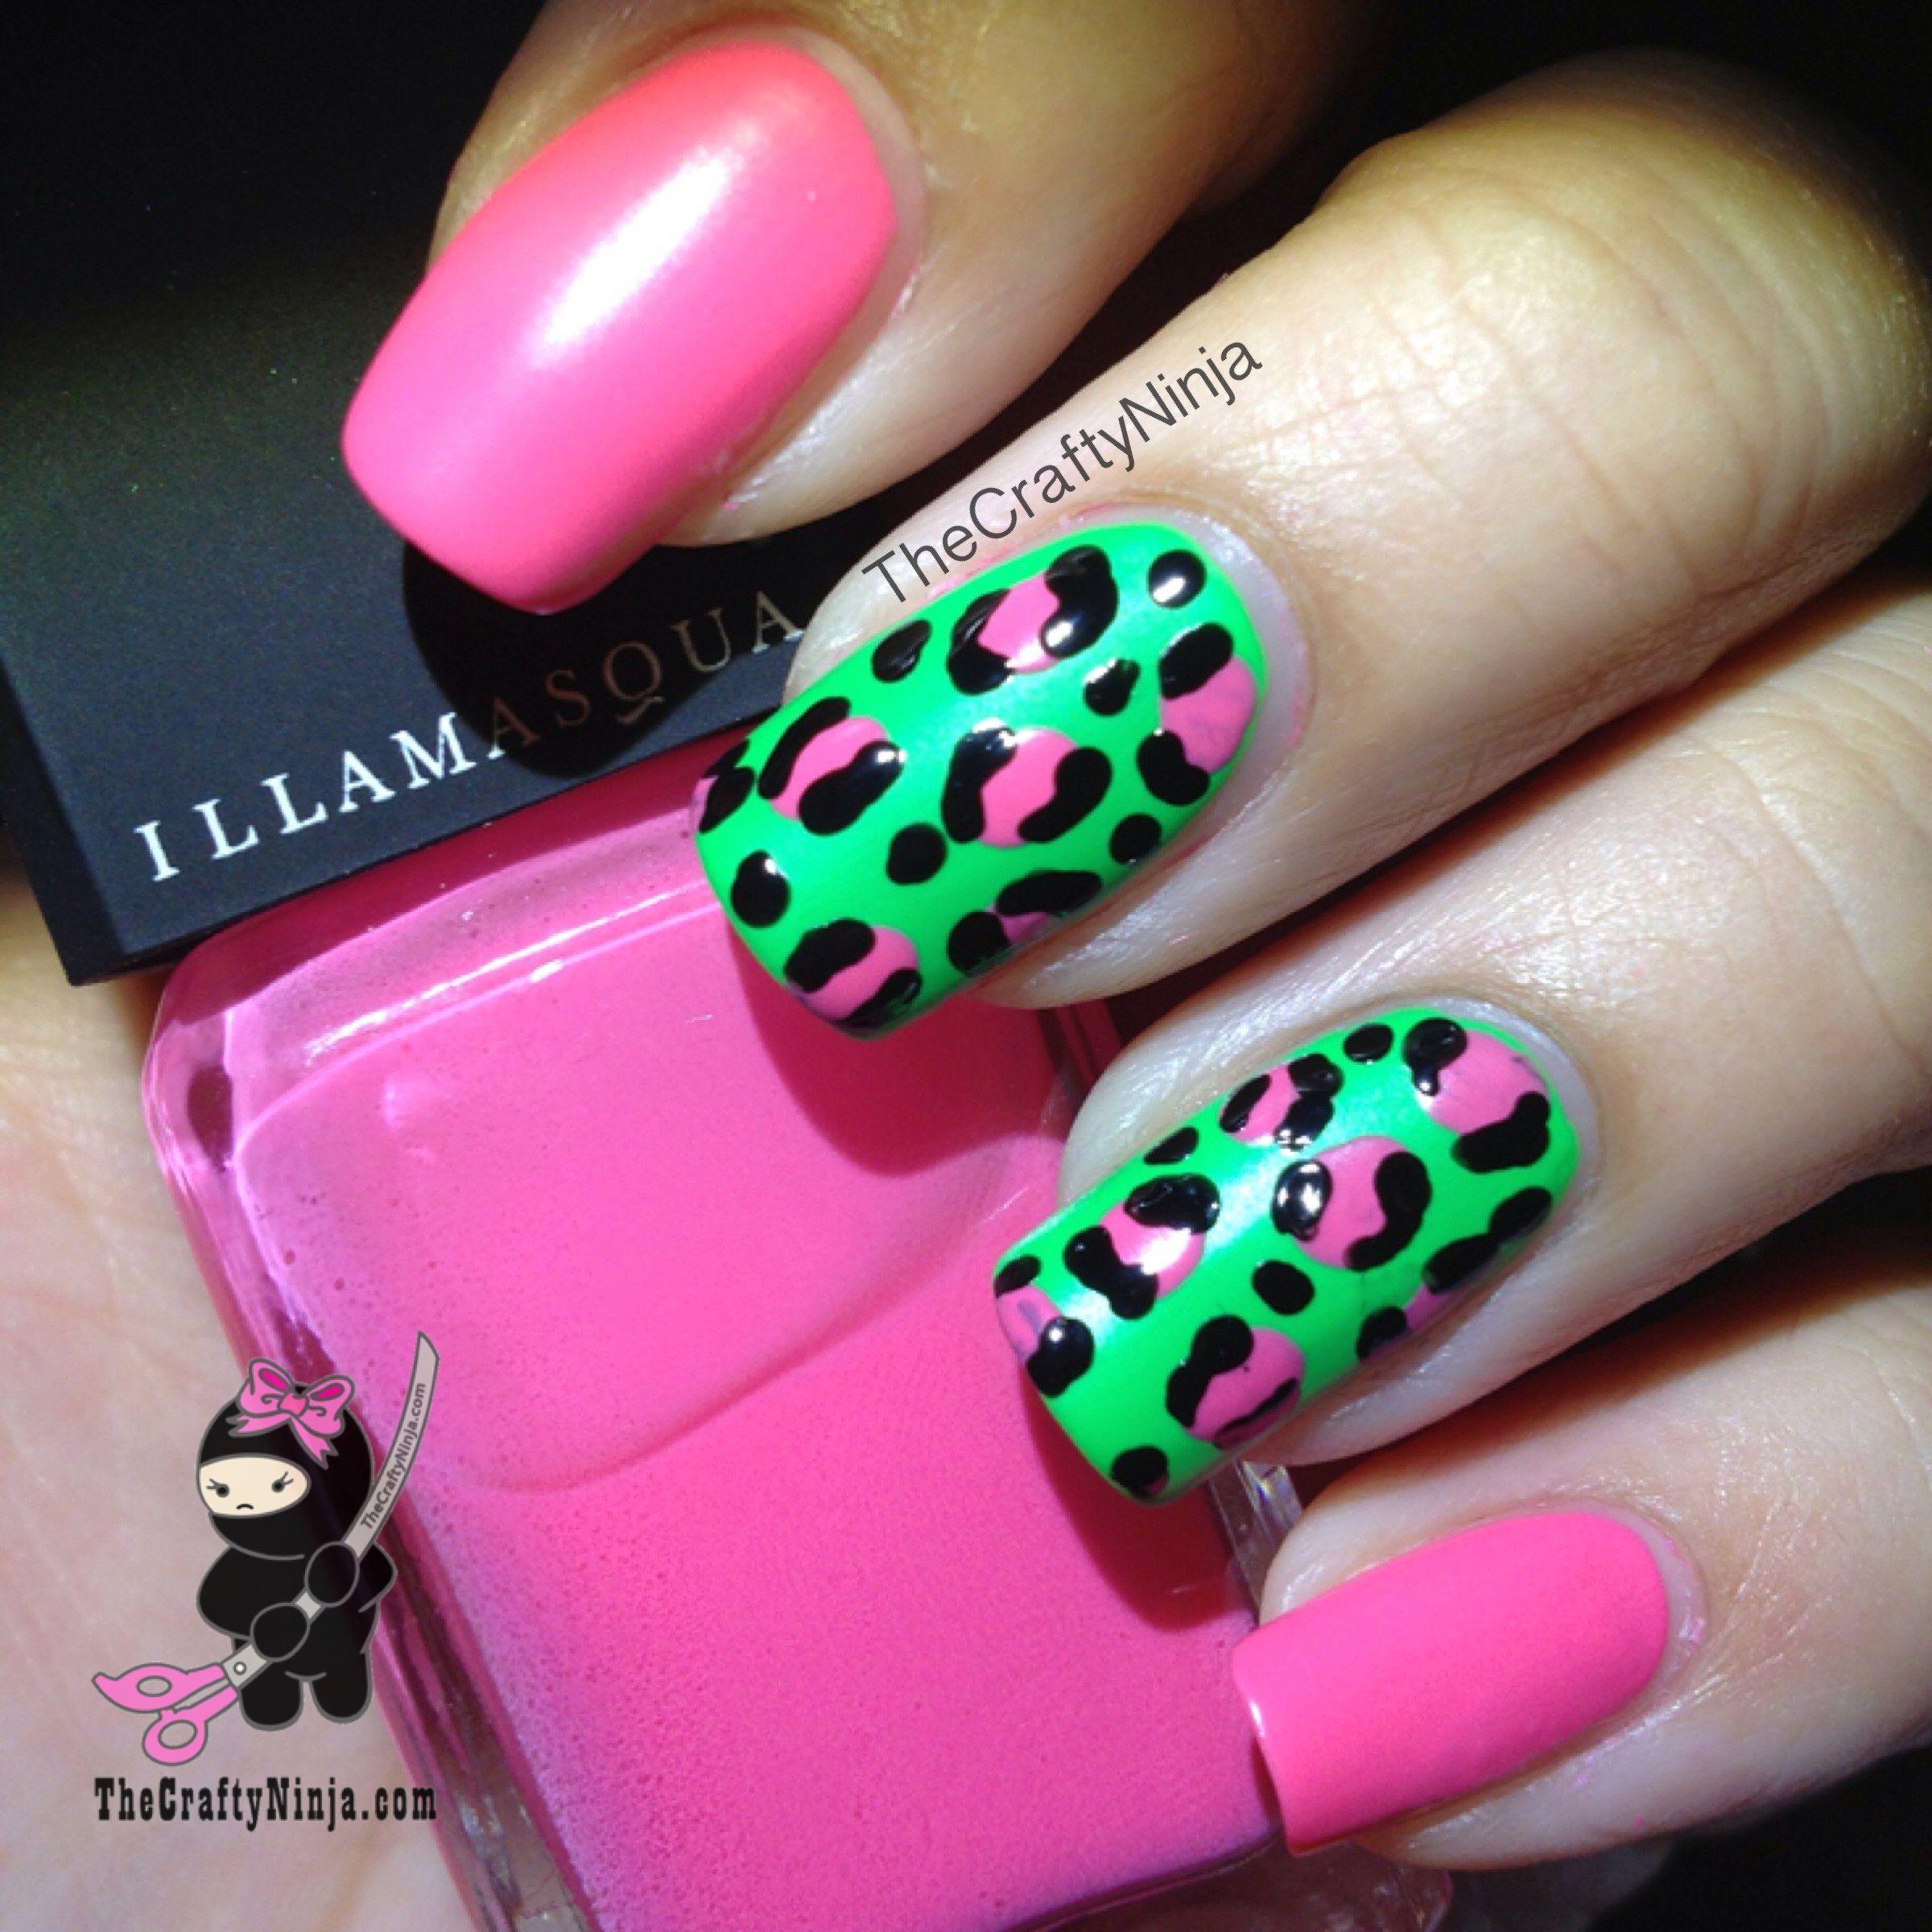 Neon Leopard Nail Nails Nailsart Leopard Print Nails Leopard Nails Green Nails